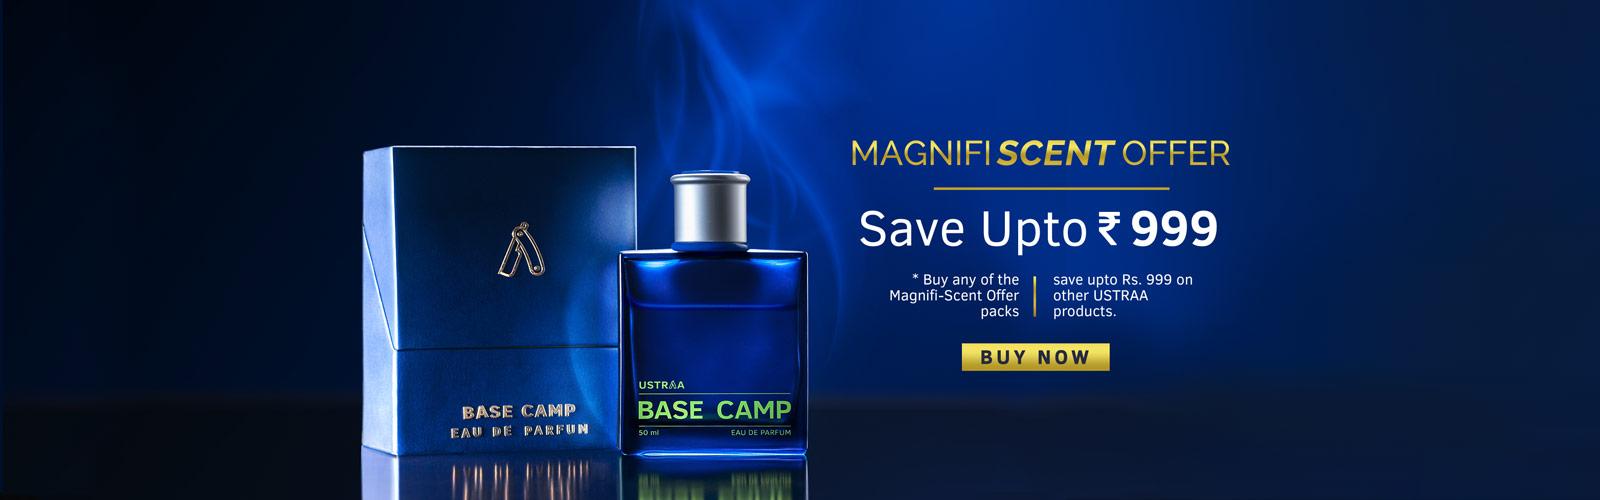 Magnifi-Scent Base Camp